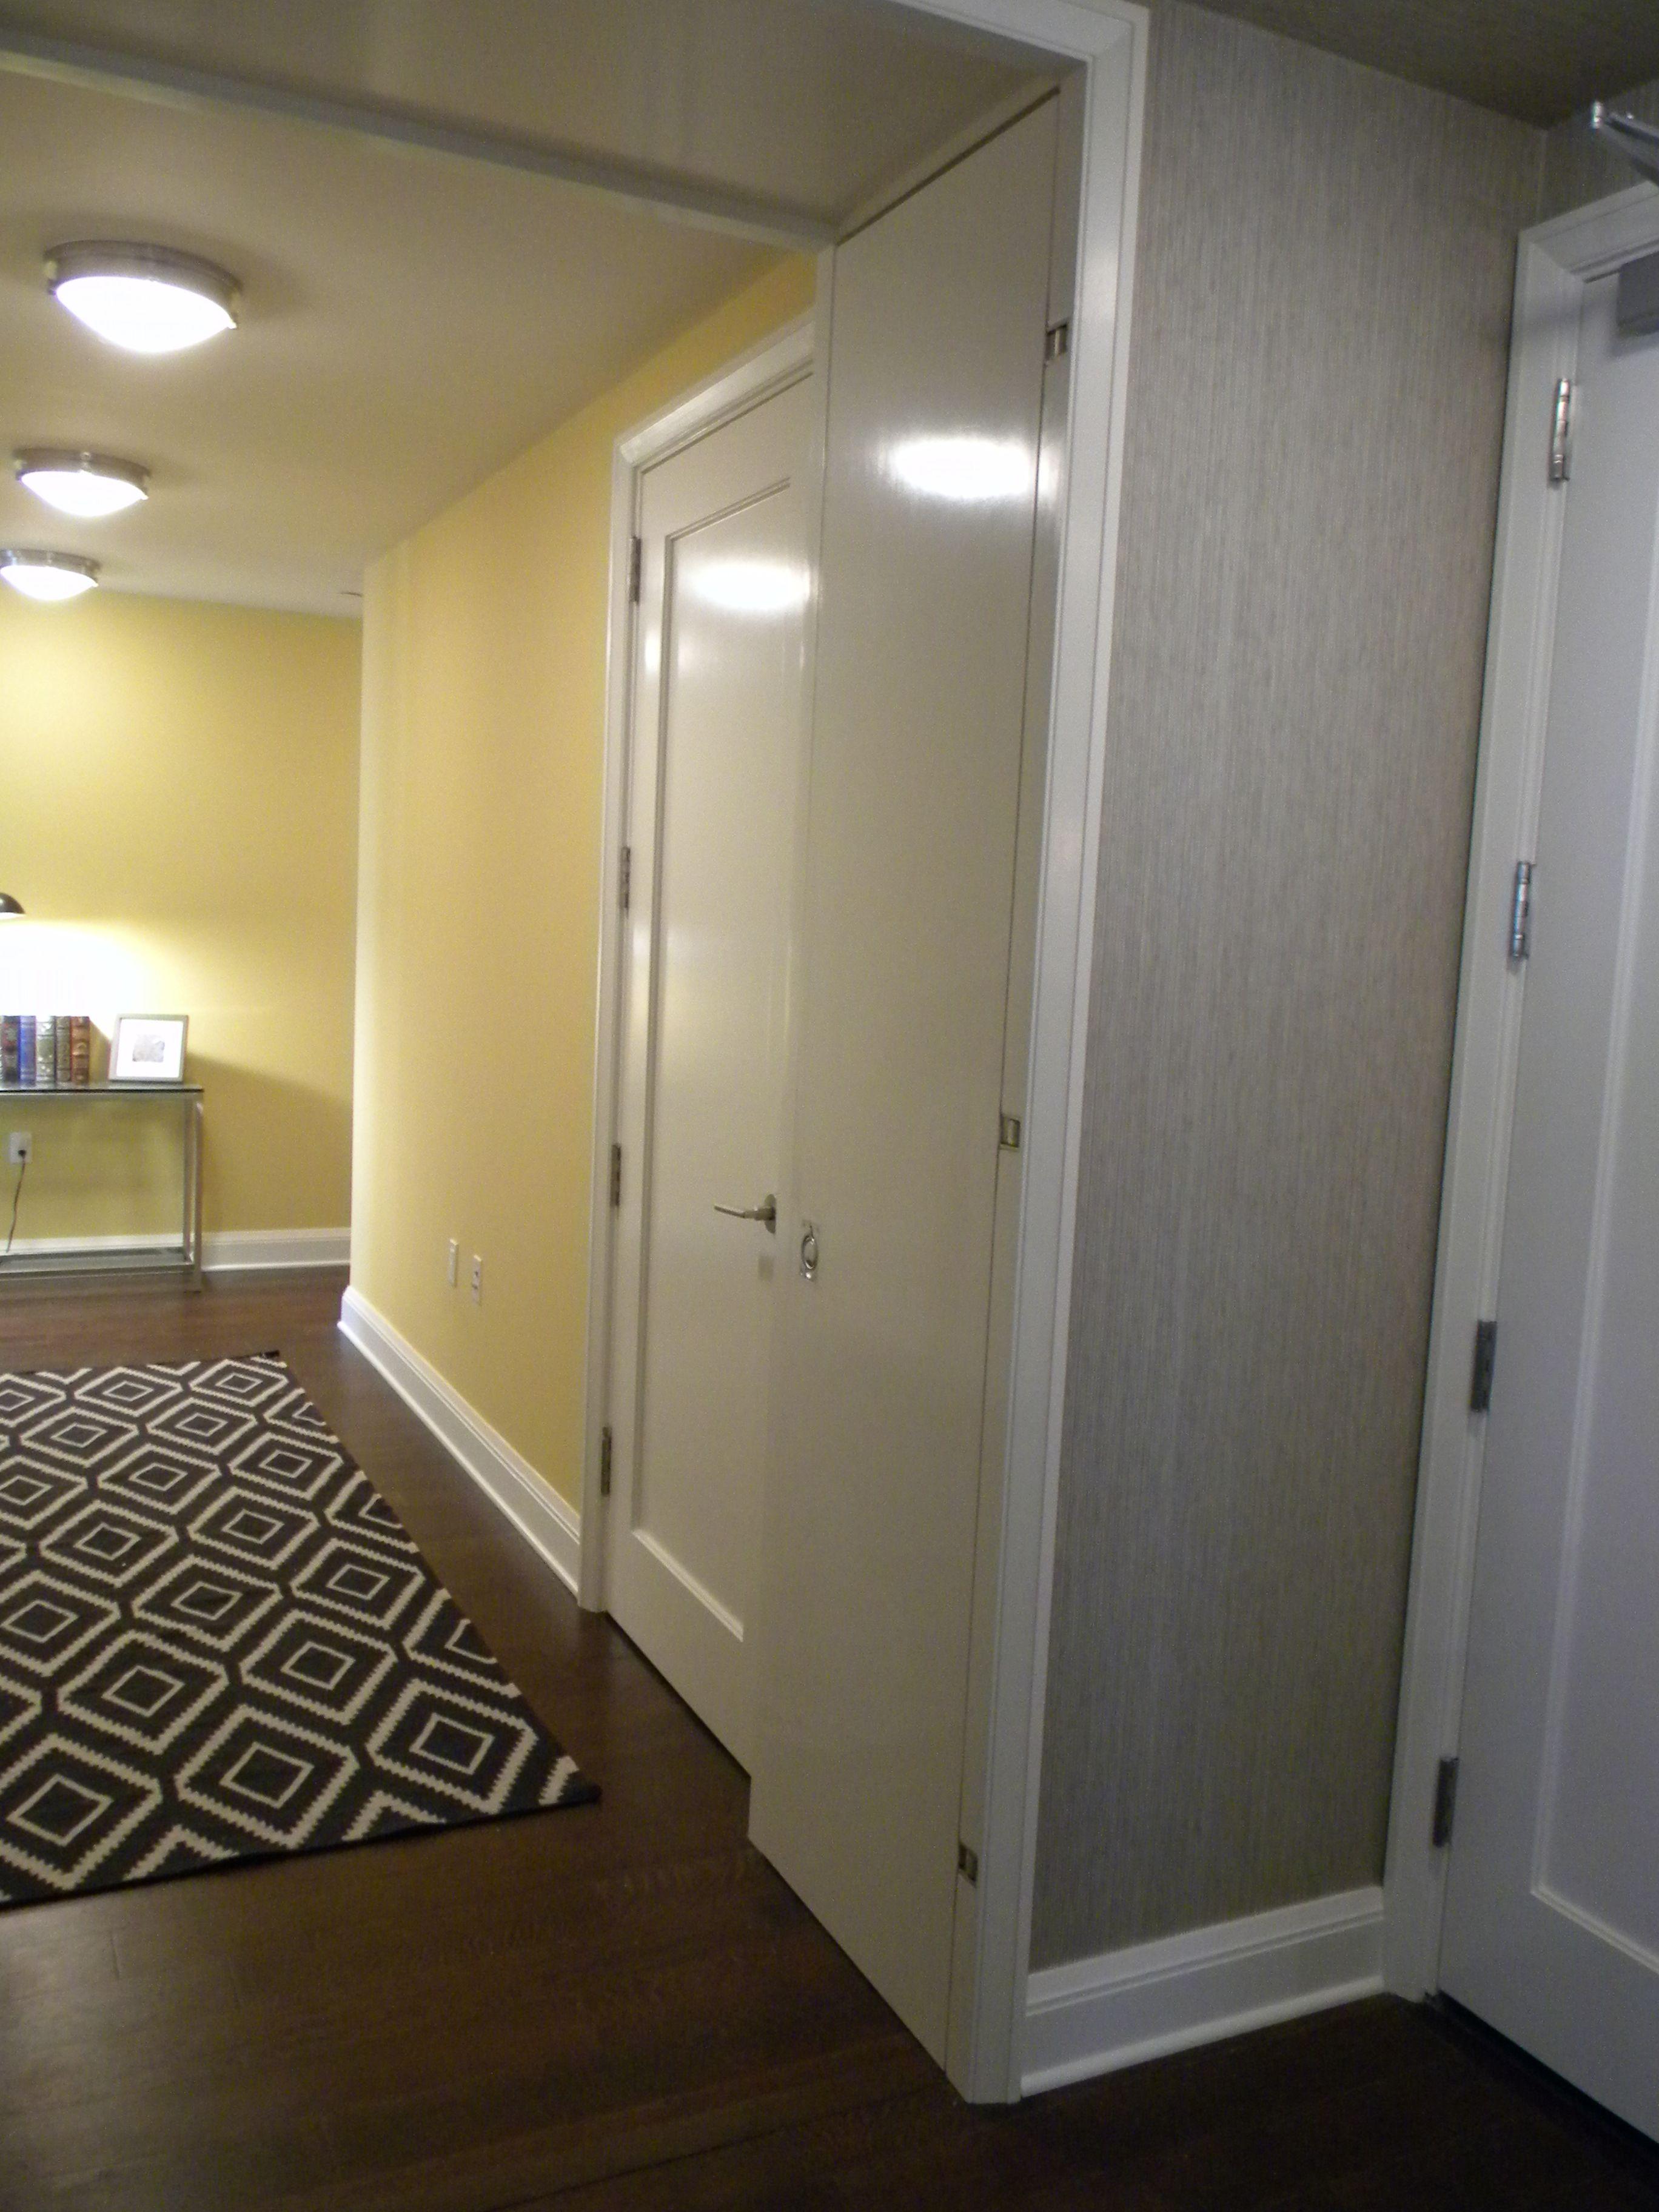 Hallway flush mount lighting  example of hallway with flushmount lighting   Adrian  Pinterest